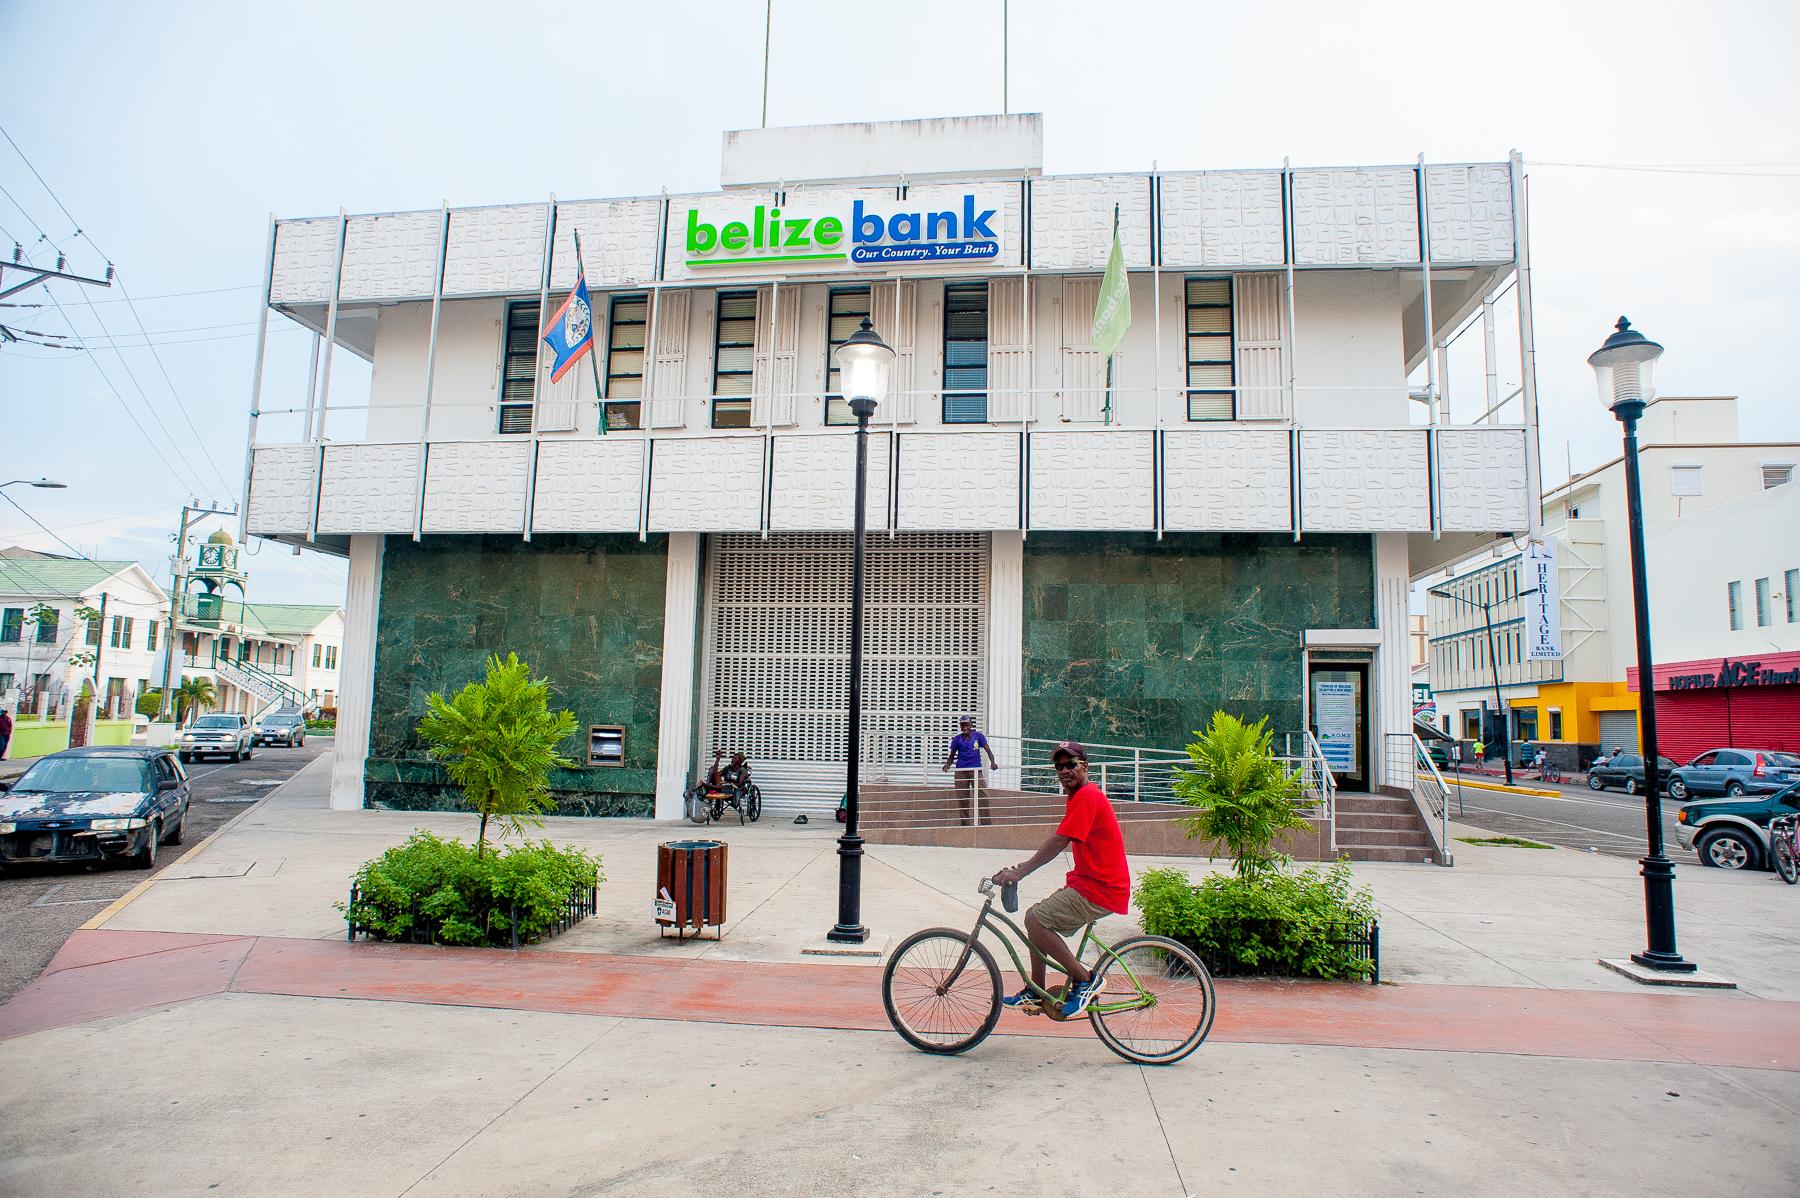 CAPTION:A cyclist rides past Belize Bank in downtown Belize City, April 23, 2017. Photo courtesy Caribbean Network Operators Group.